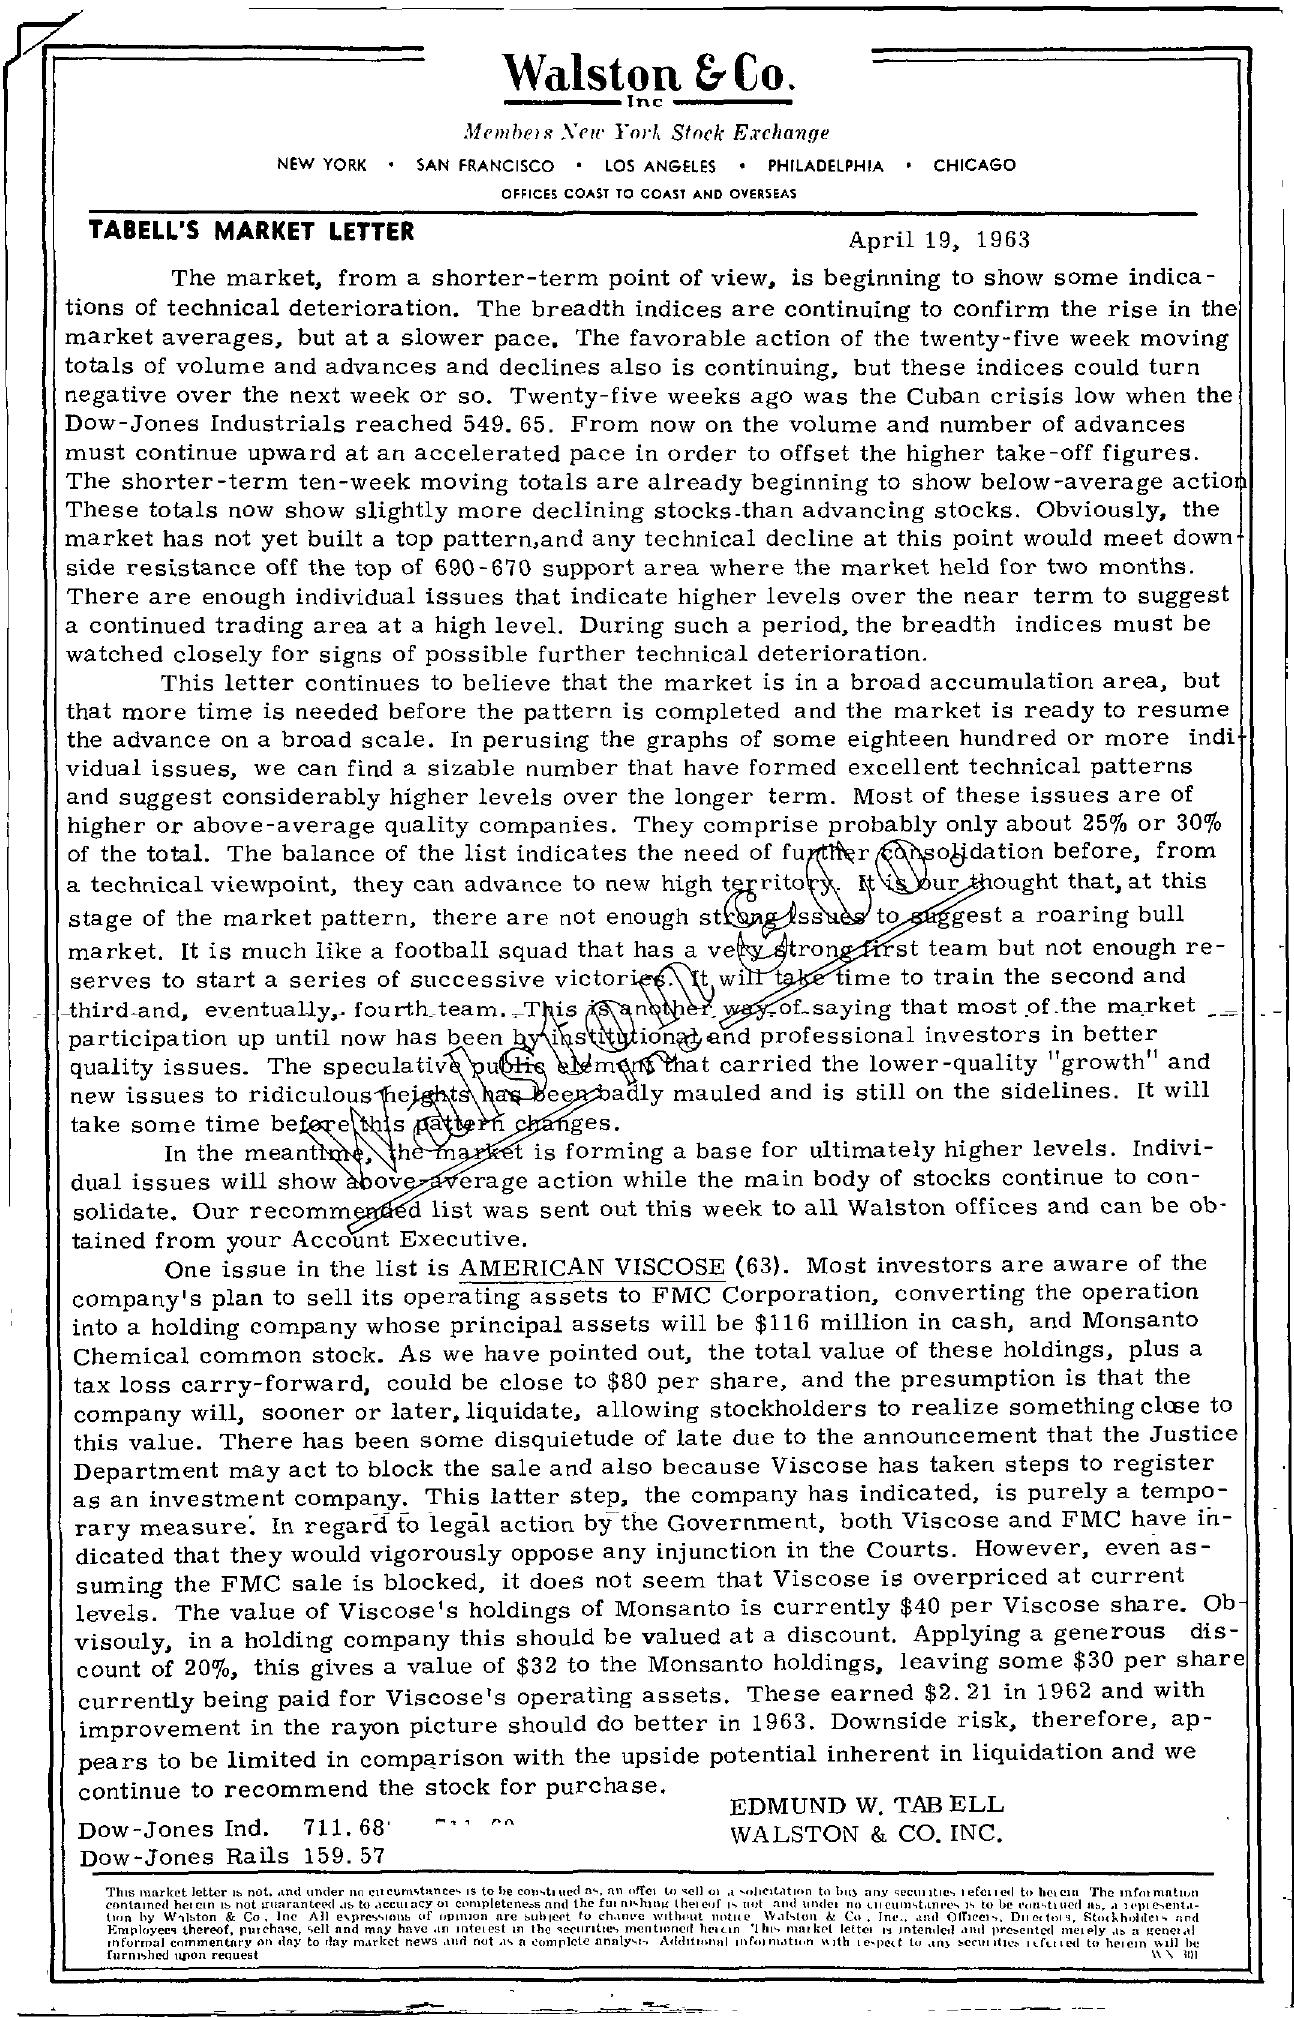 Tabell's Market Letter - April 19, 1963